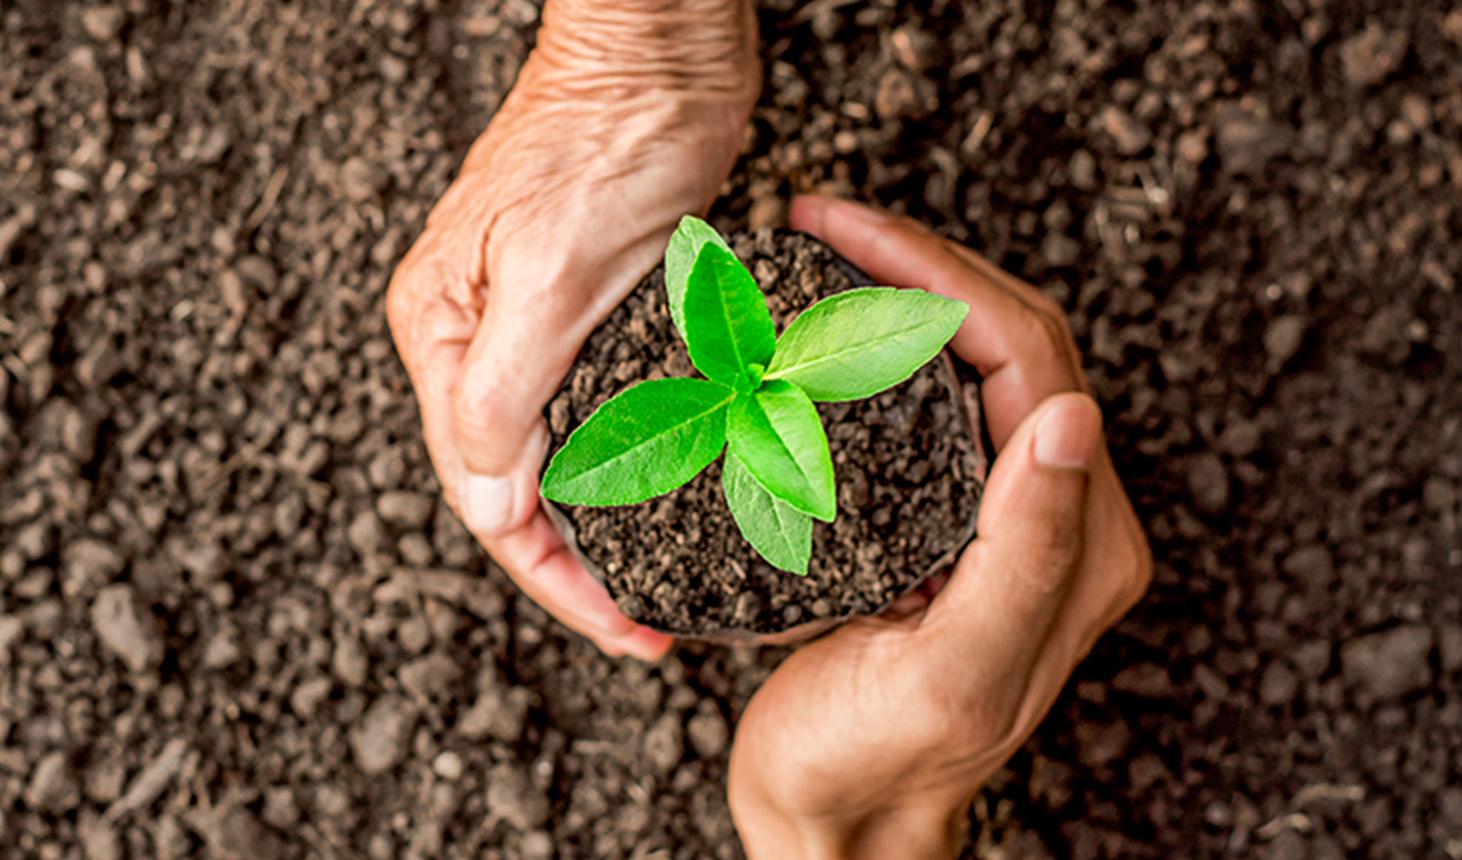 A sustentabilidade na mira dos jovens